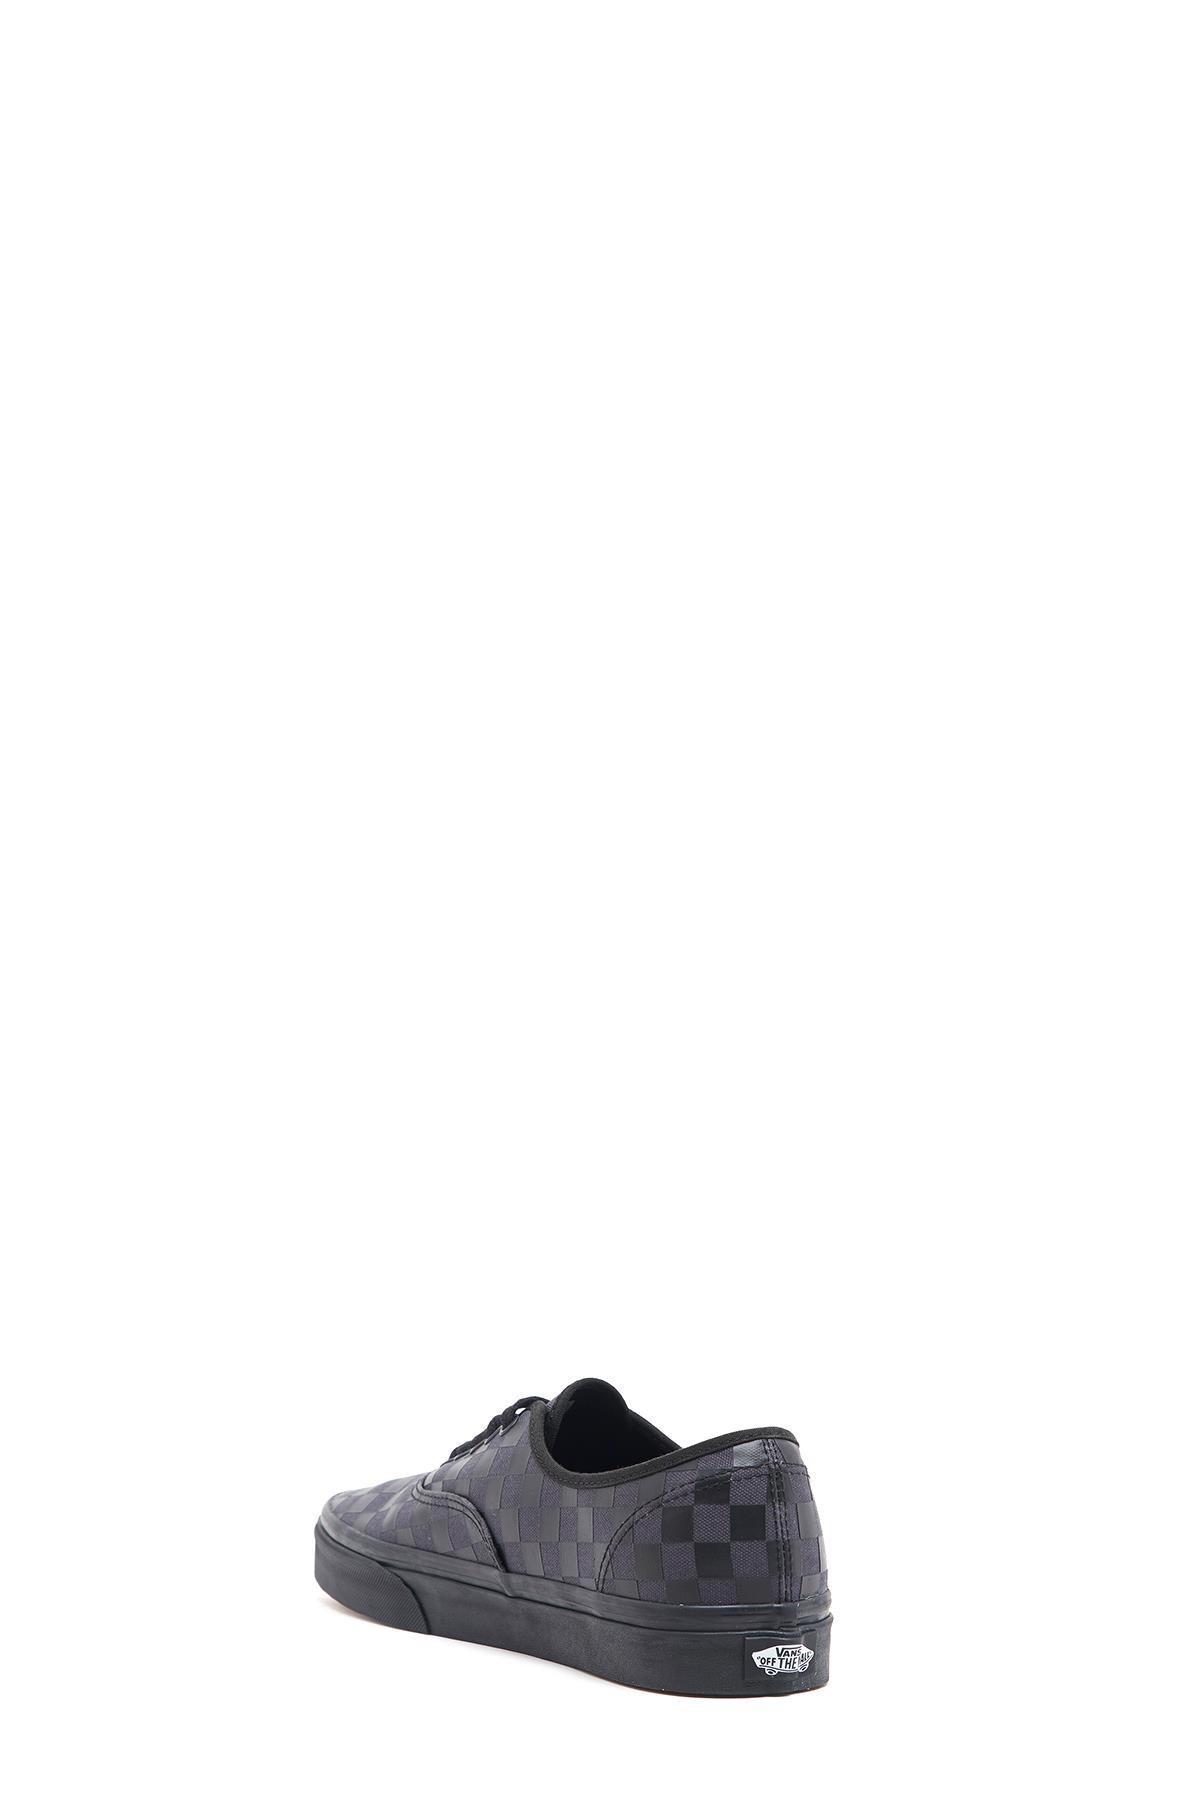 Lyst - Vans  authentic  Sneakers for Men 085547ccb